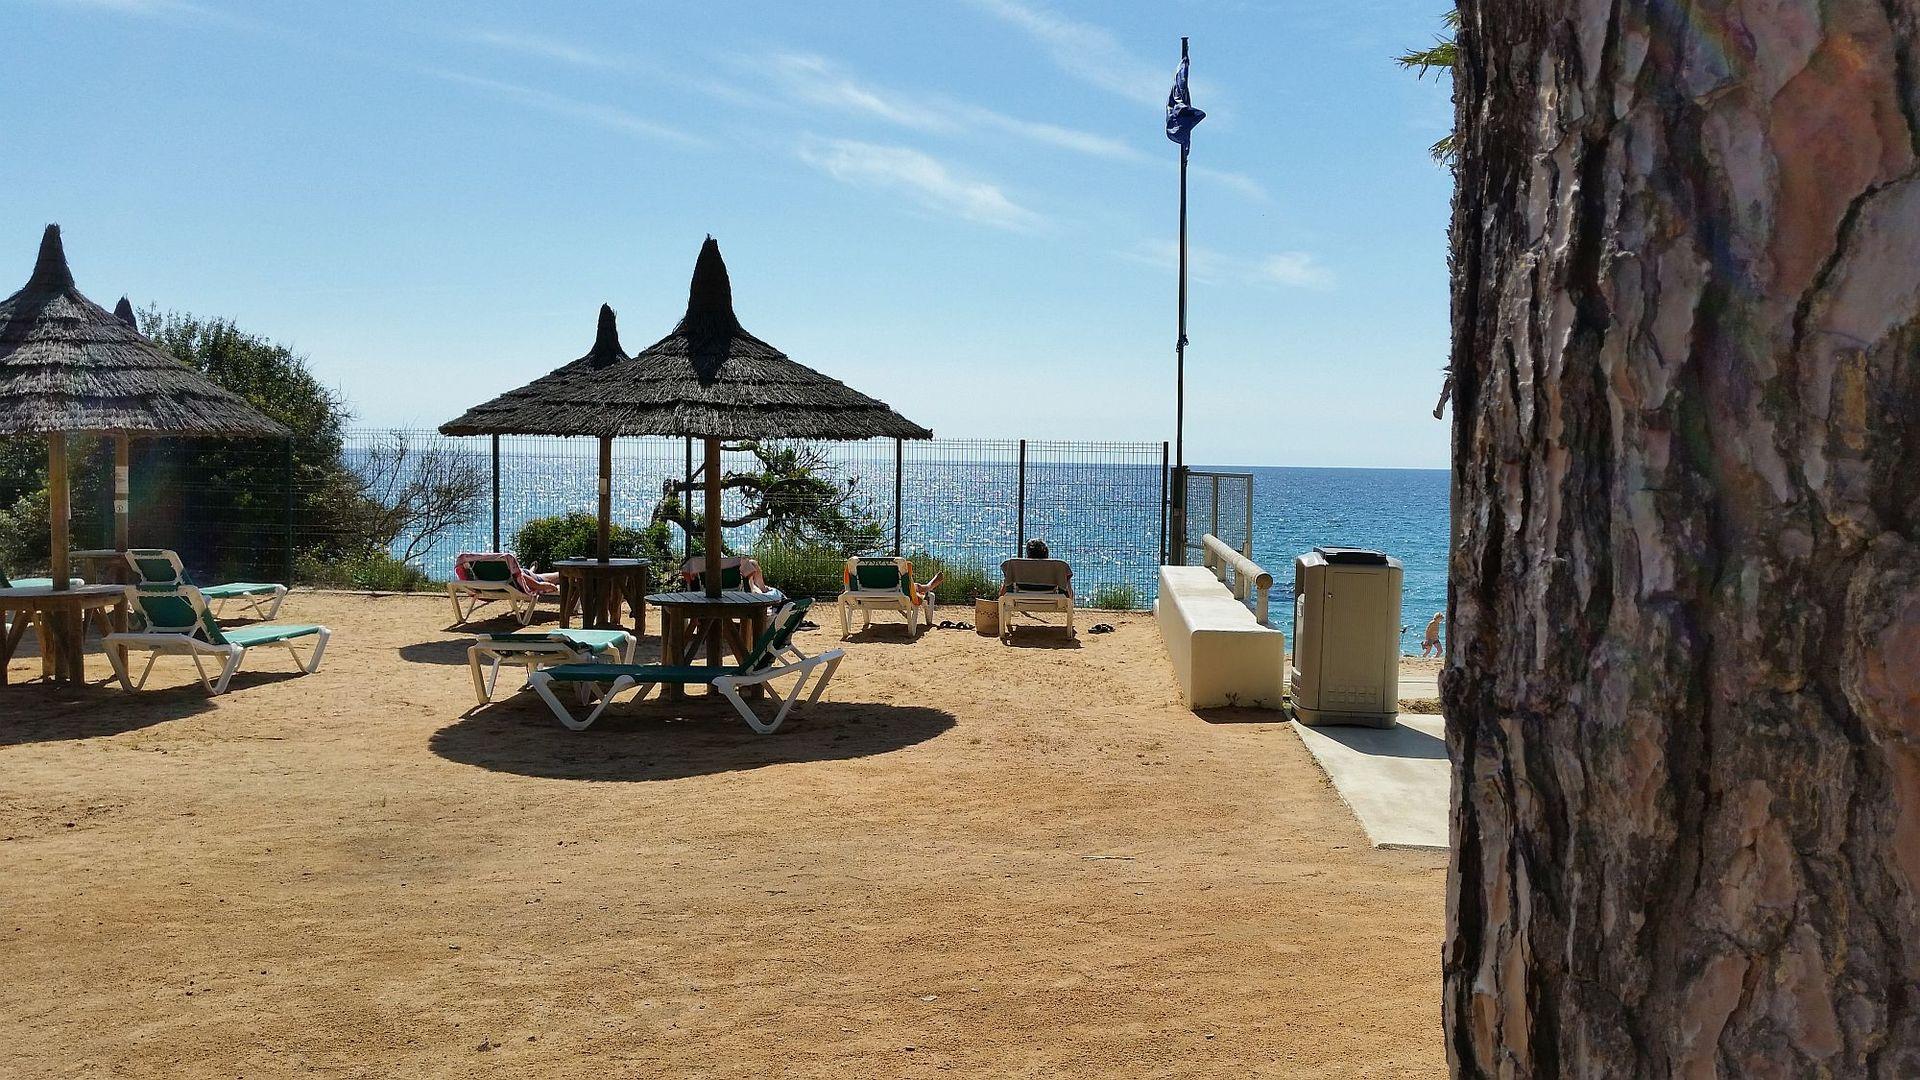 Spanje-Calonge-Camping%20Senia%20Cala%20Gogo-ExtraLarge Campings Spanje